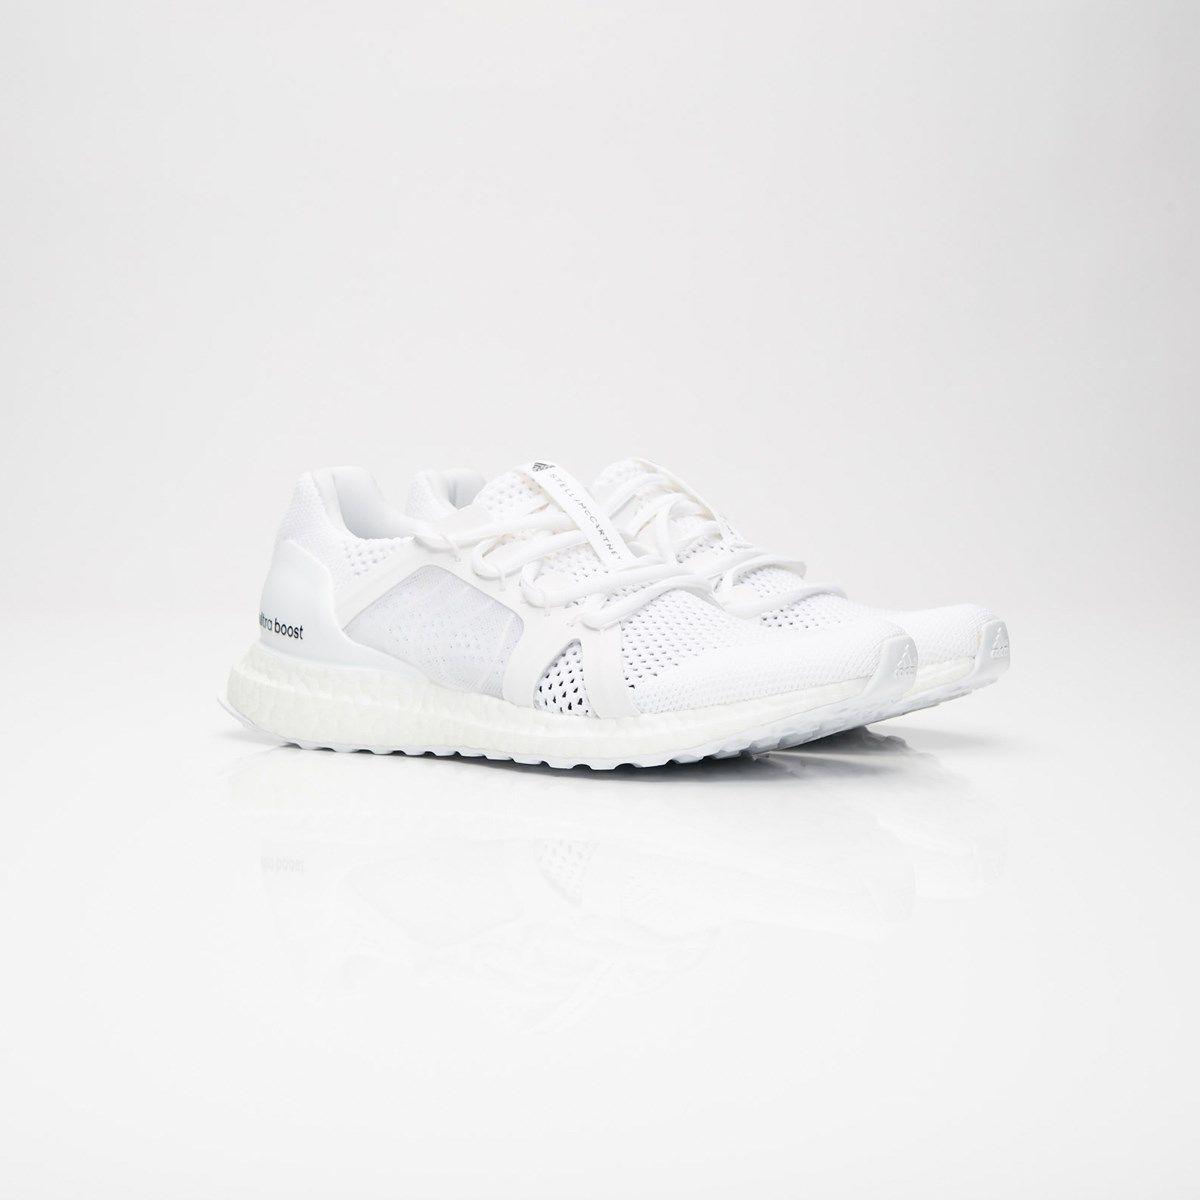 1e86d6fae0d84 adidas UltraBOOST - Bc0994 - Sneakersnstuff